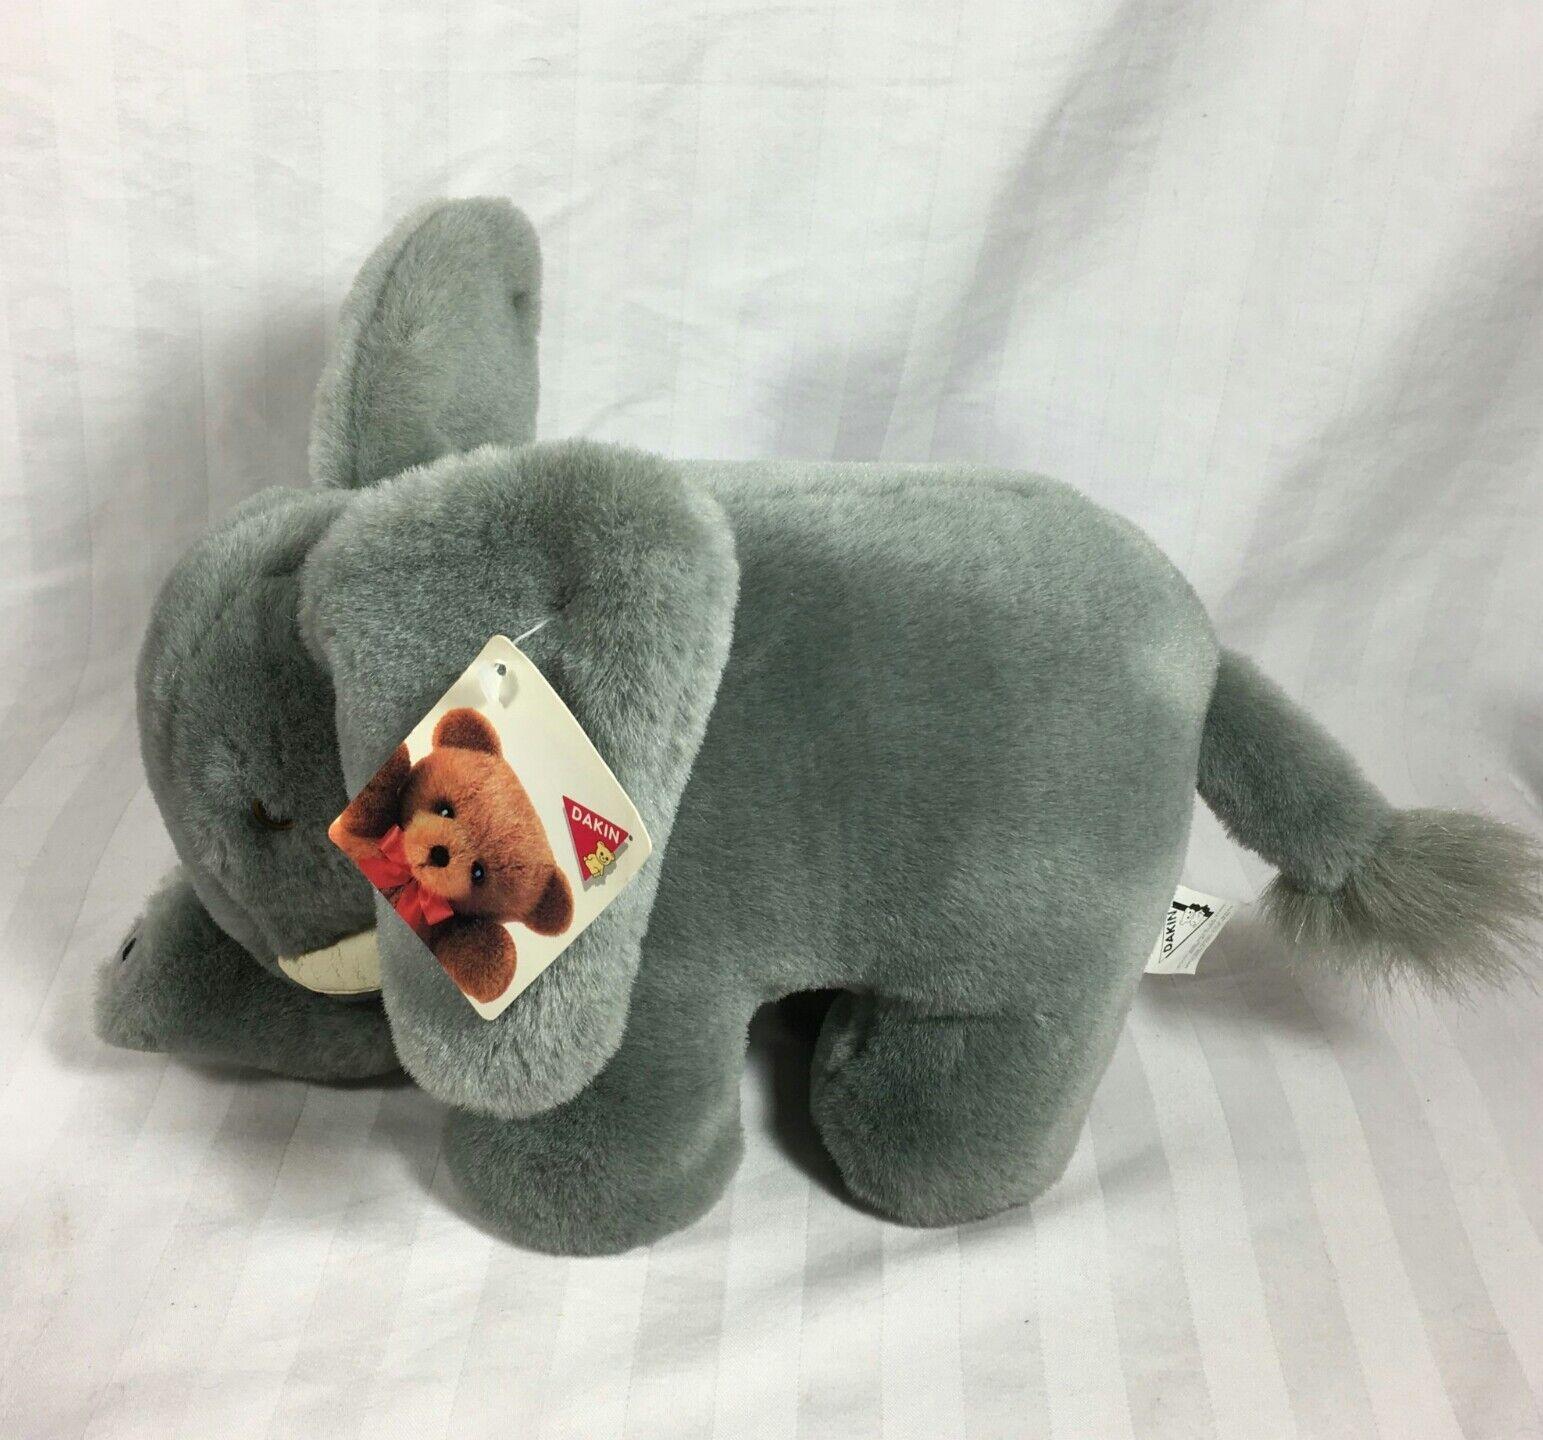 Vintage Dakin Plush Elephant Applause